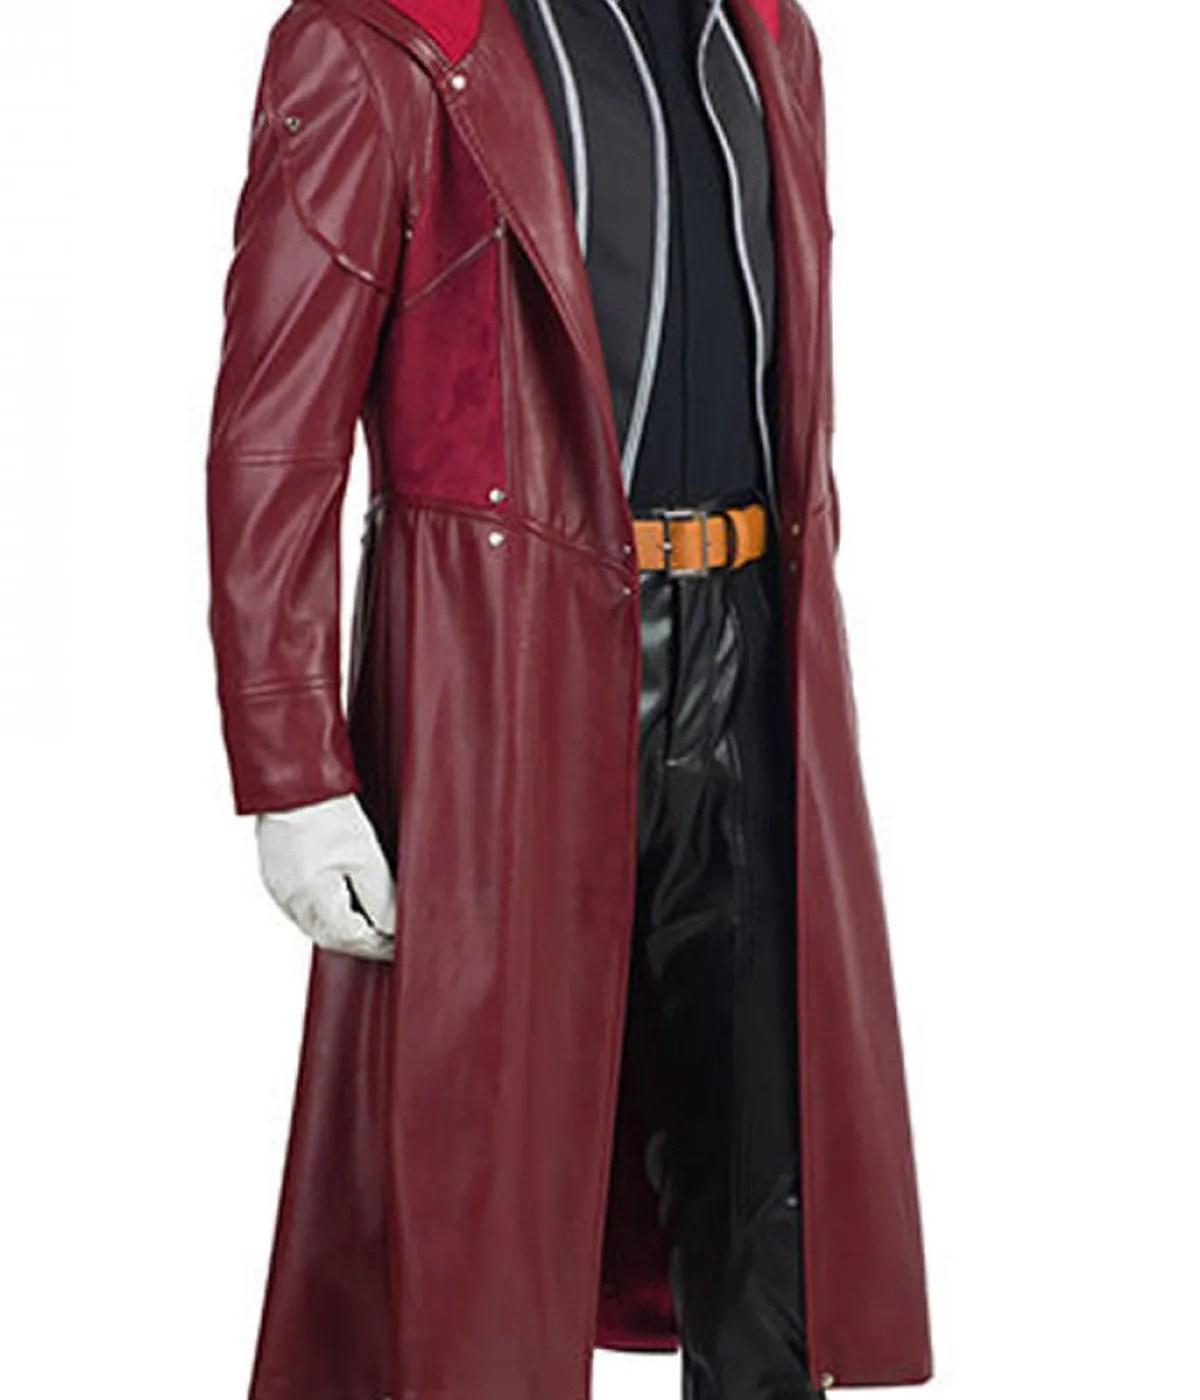 edward-elric-fullmetal-alchemist-leather-coat